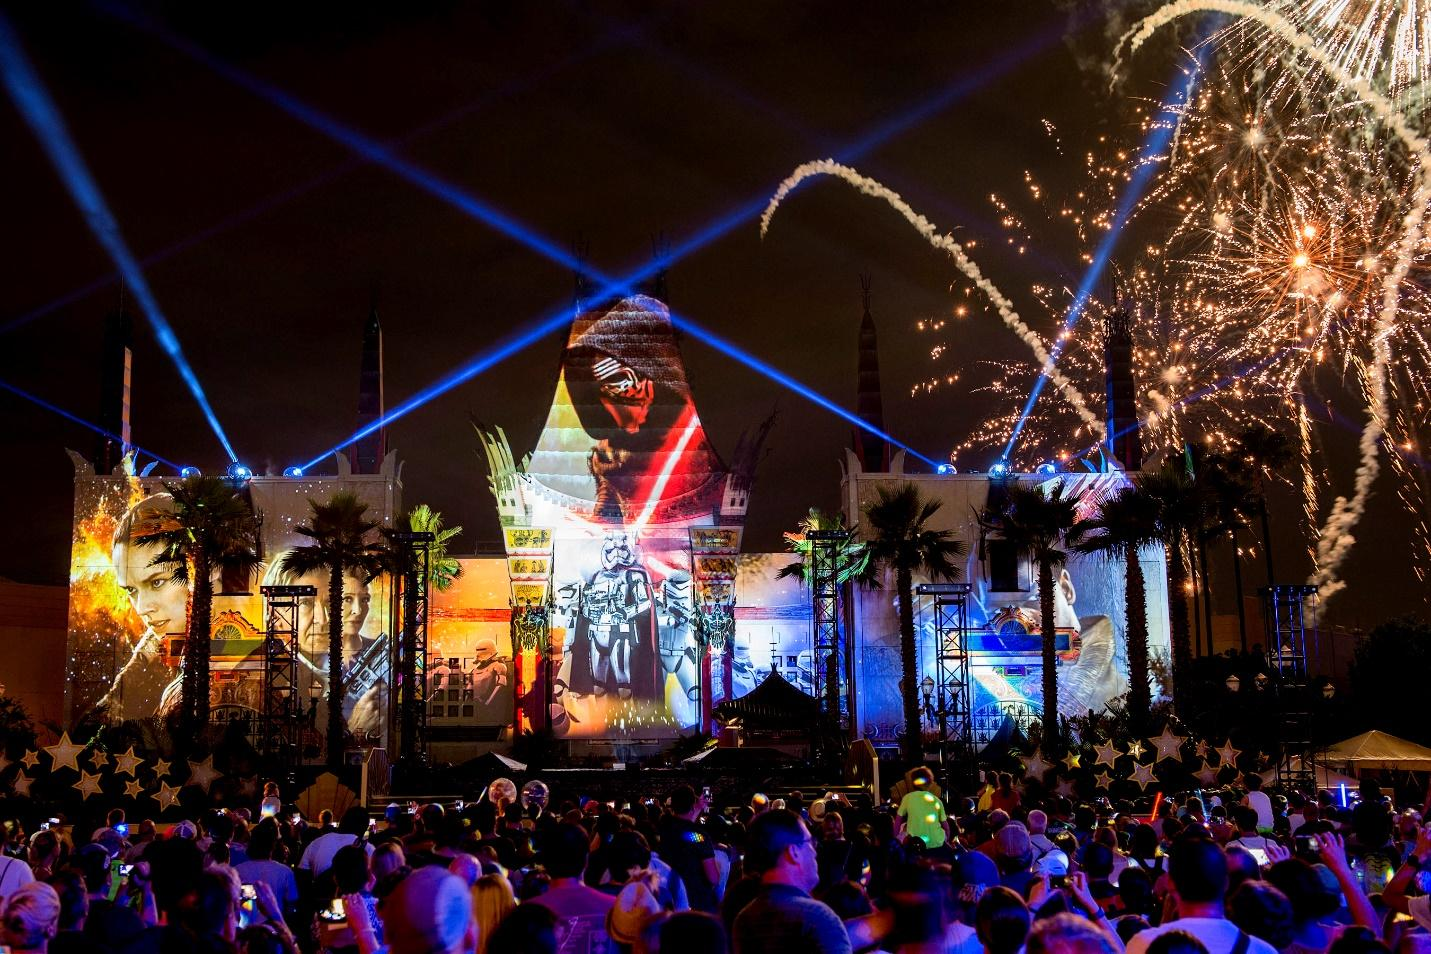 Star Wars Galactic Spectacular at Hollywood Studios in Walt Disney World